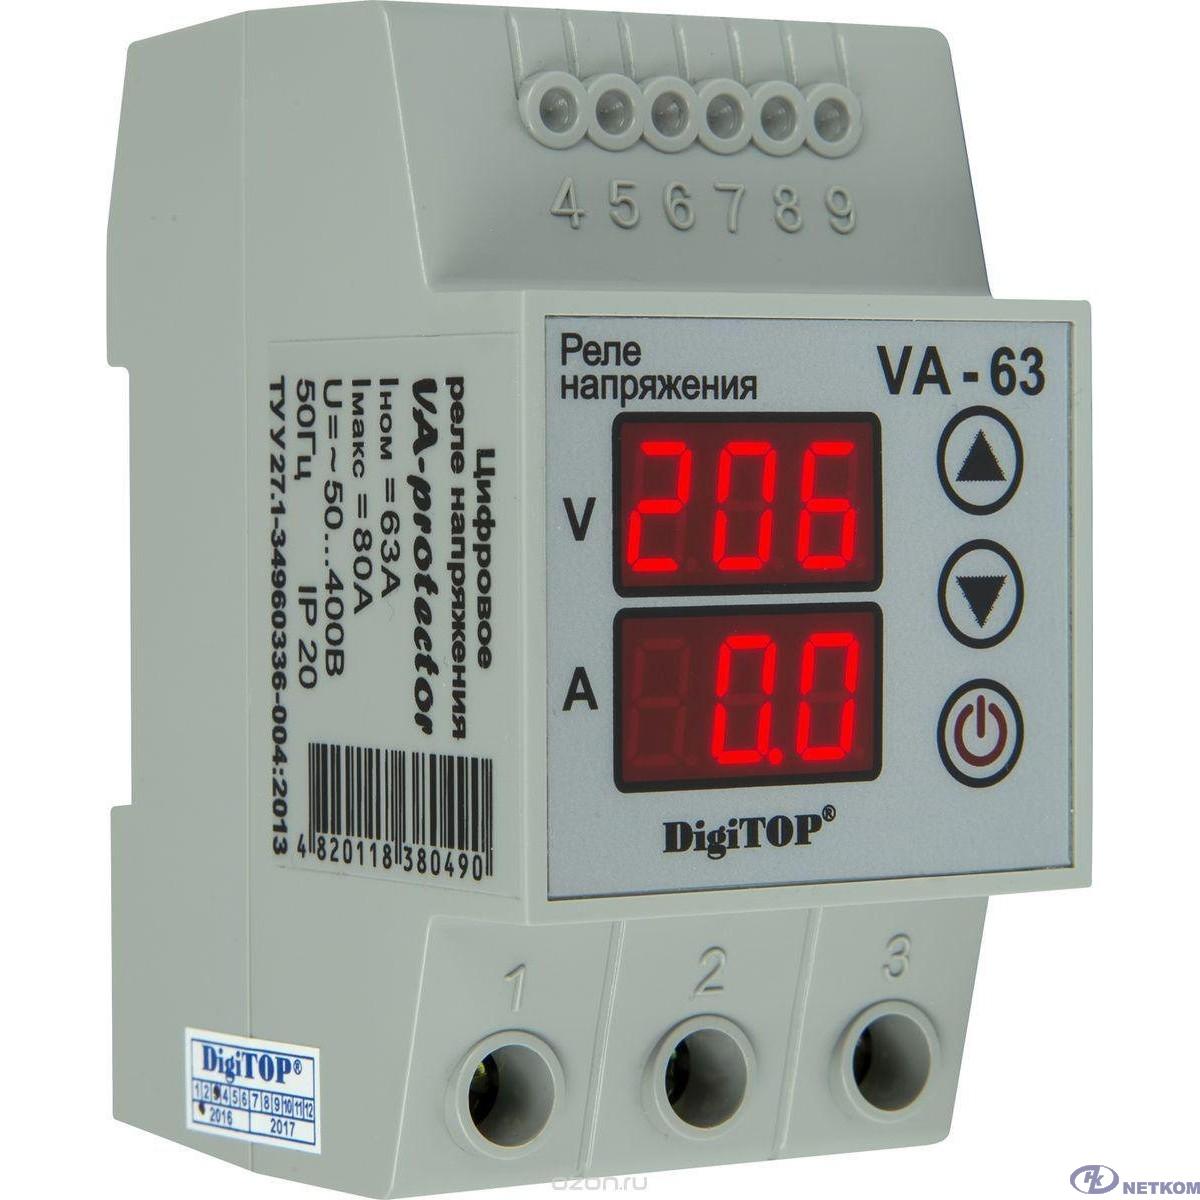 DigiTOP VA-63A Реле напряжения с контролем тока на DIN-рейку, 0-400В, макс. 80А, 5-600 сек.